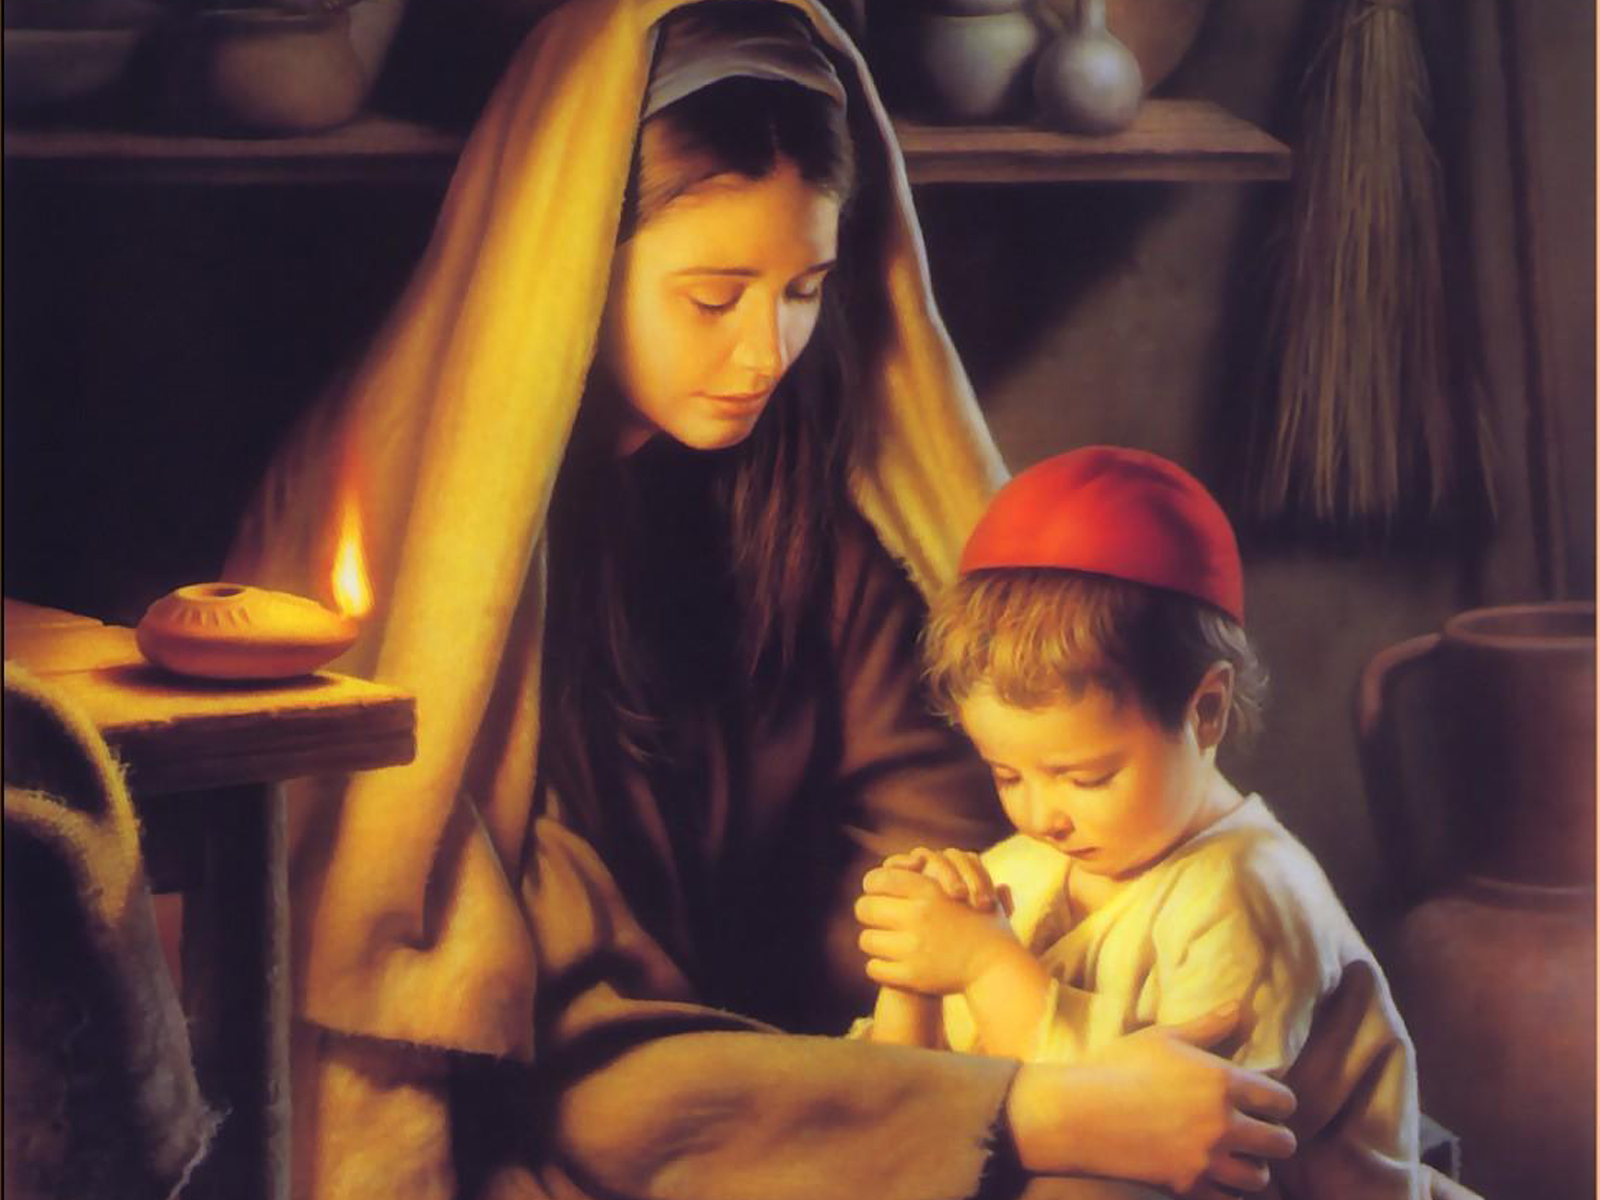 Jesus Cristo nos pede para sermos misericordiosos